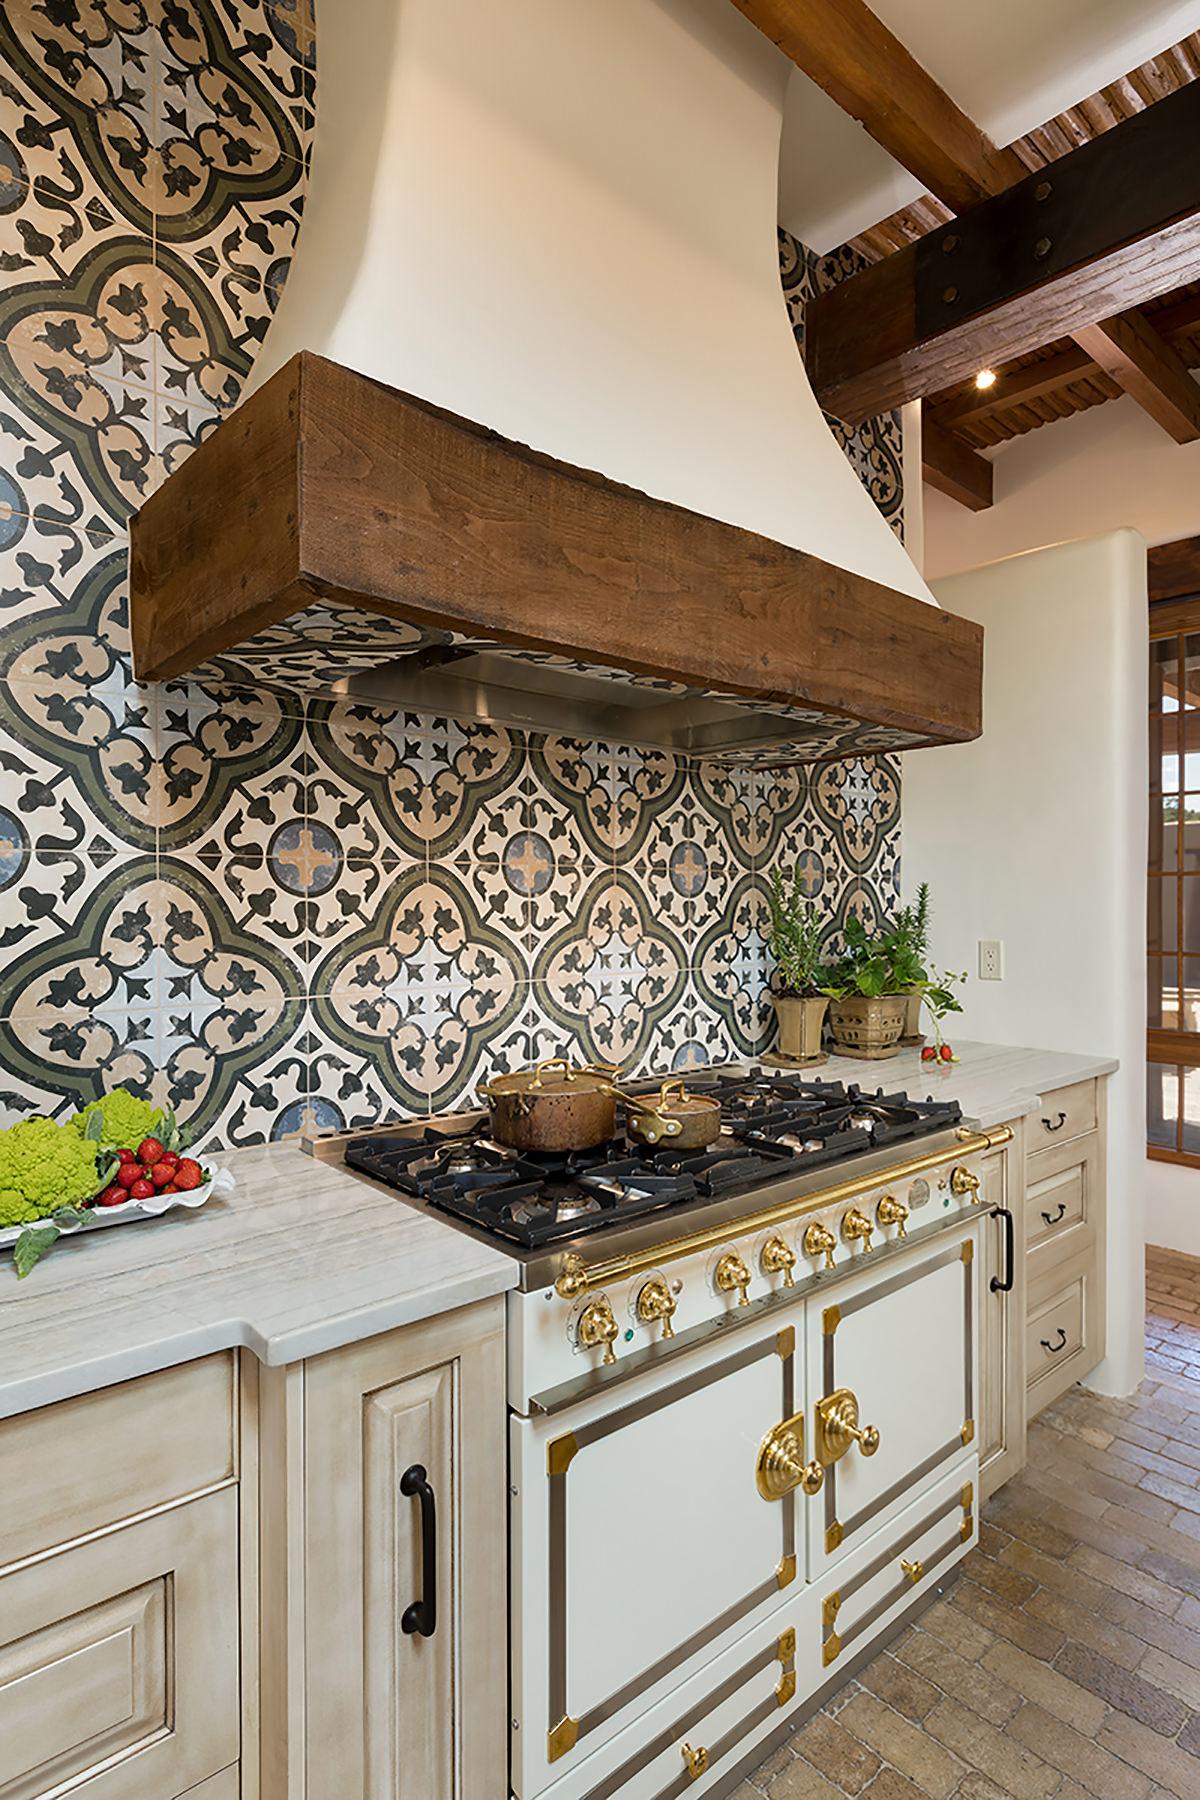 santa-fe-new-mexico-kitchen-breakfast-nook-interior-design-montgomery-home-6.jpg